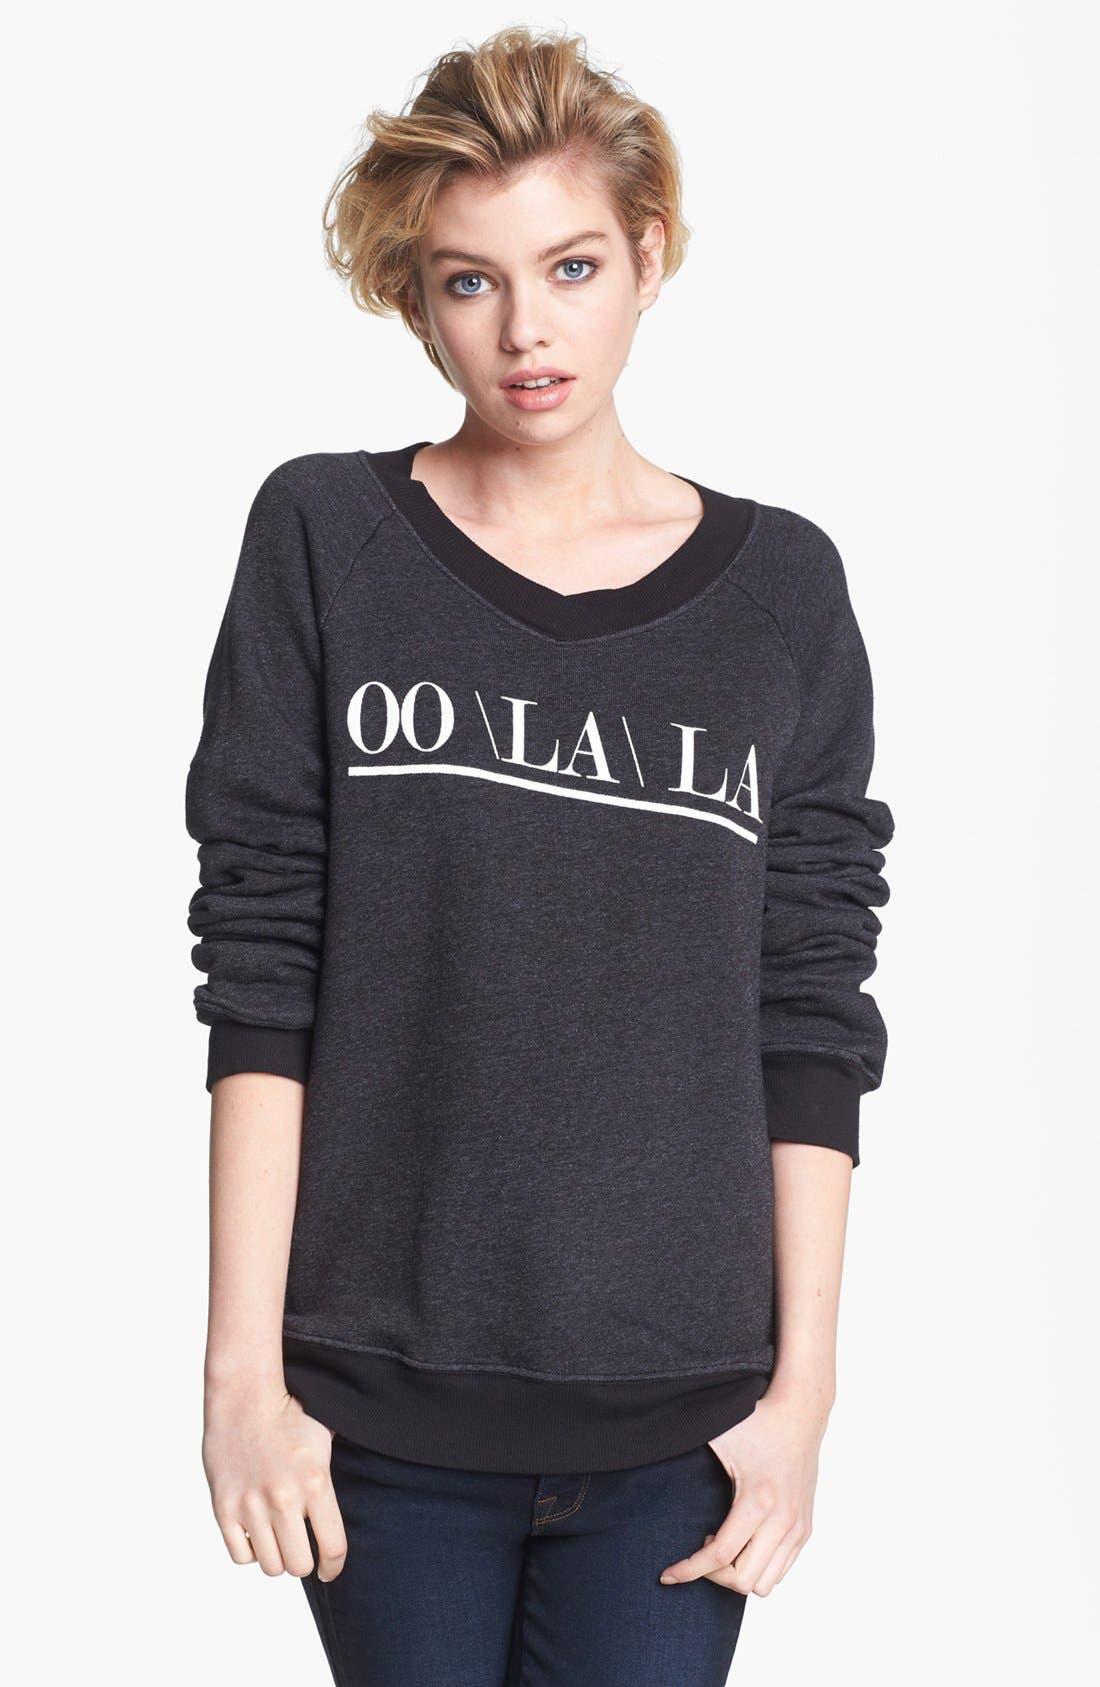 Main Image - Wildfox 'Oo La La' Sweatshirt